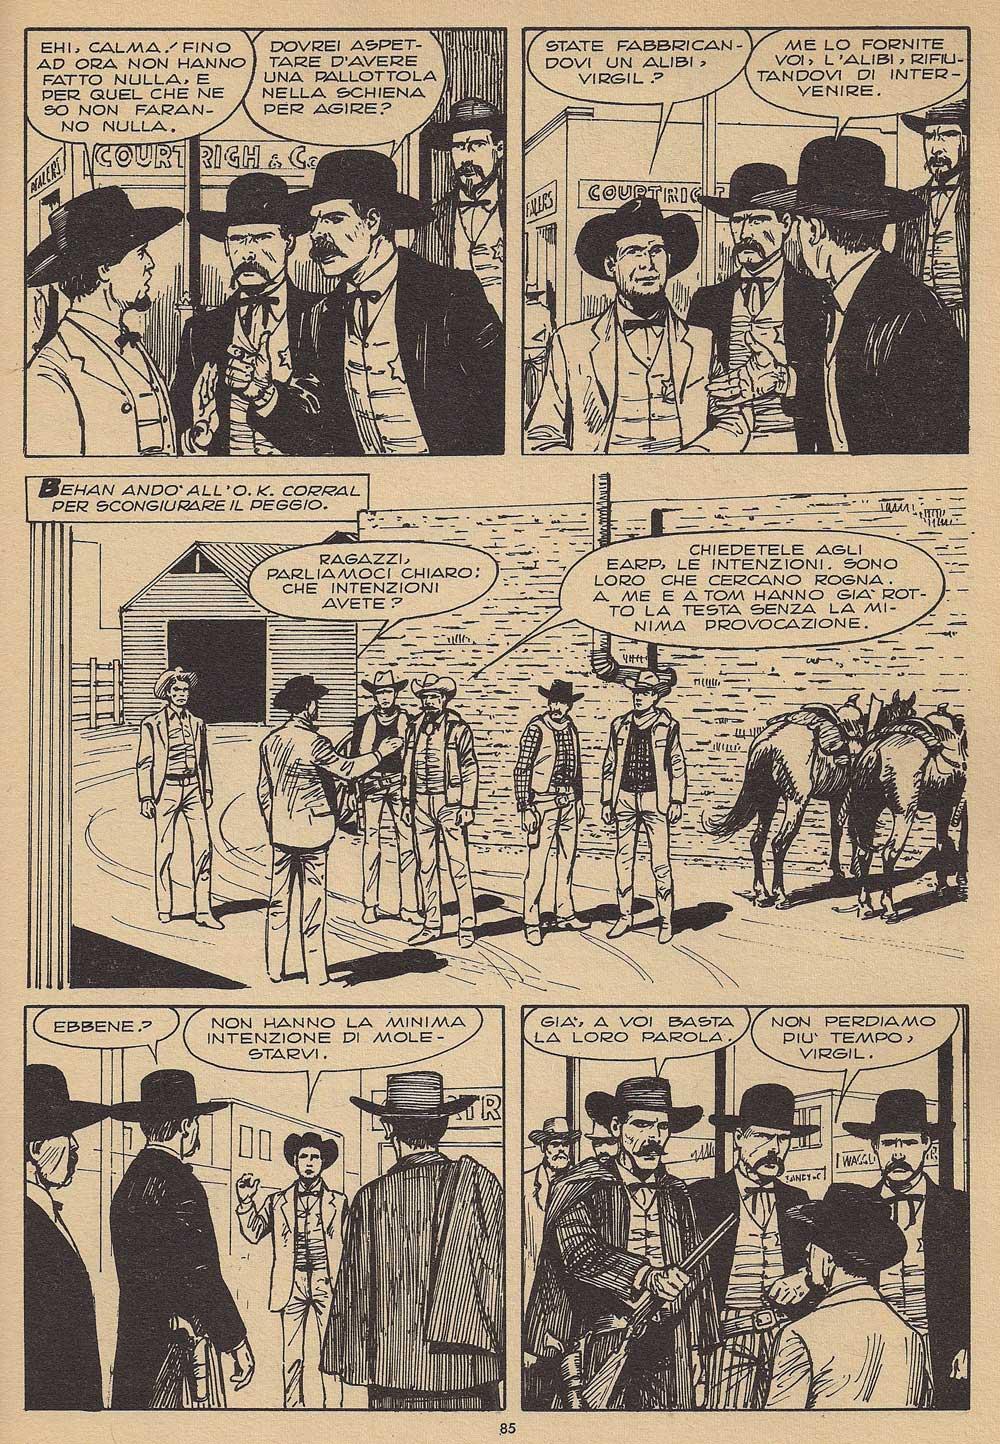 300-rino-albertarelli-4_Essential 300 comics